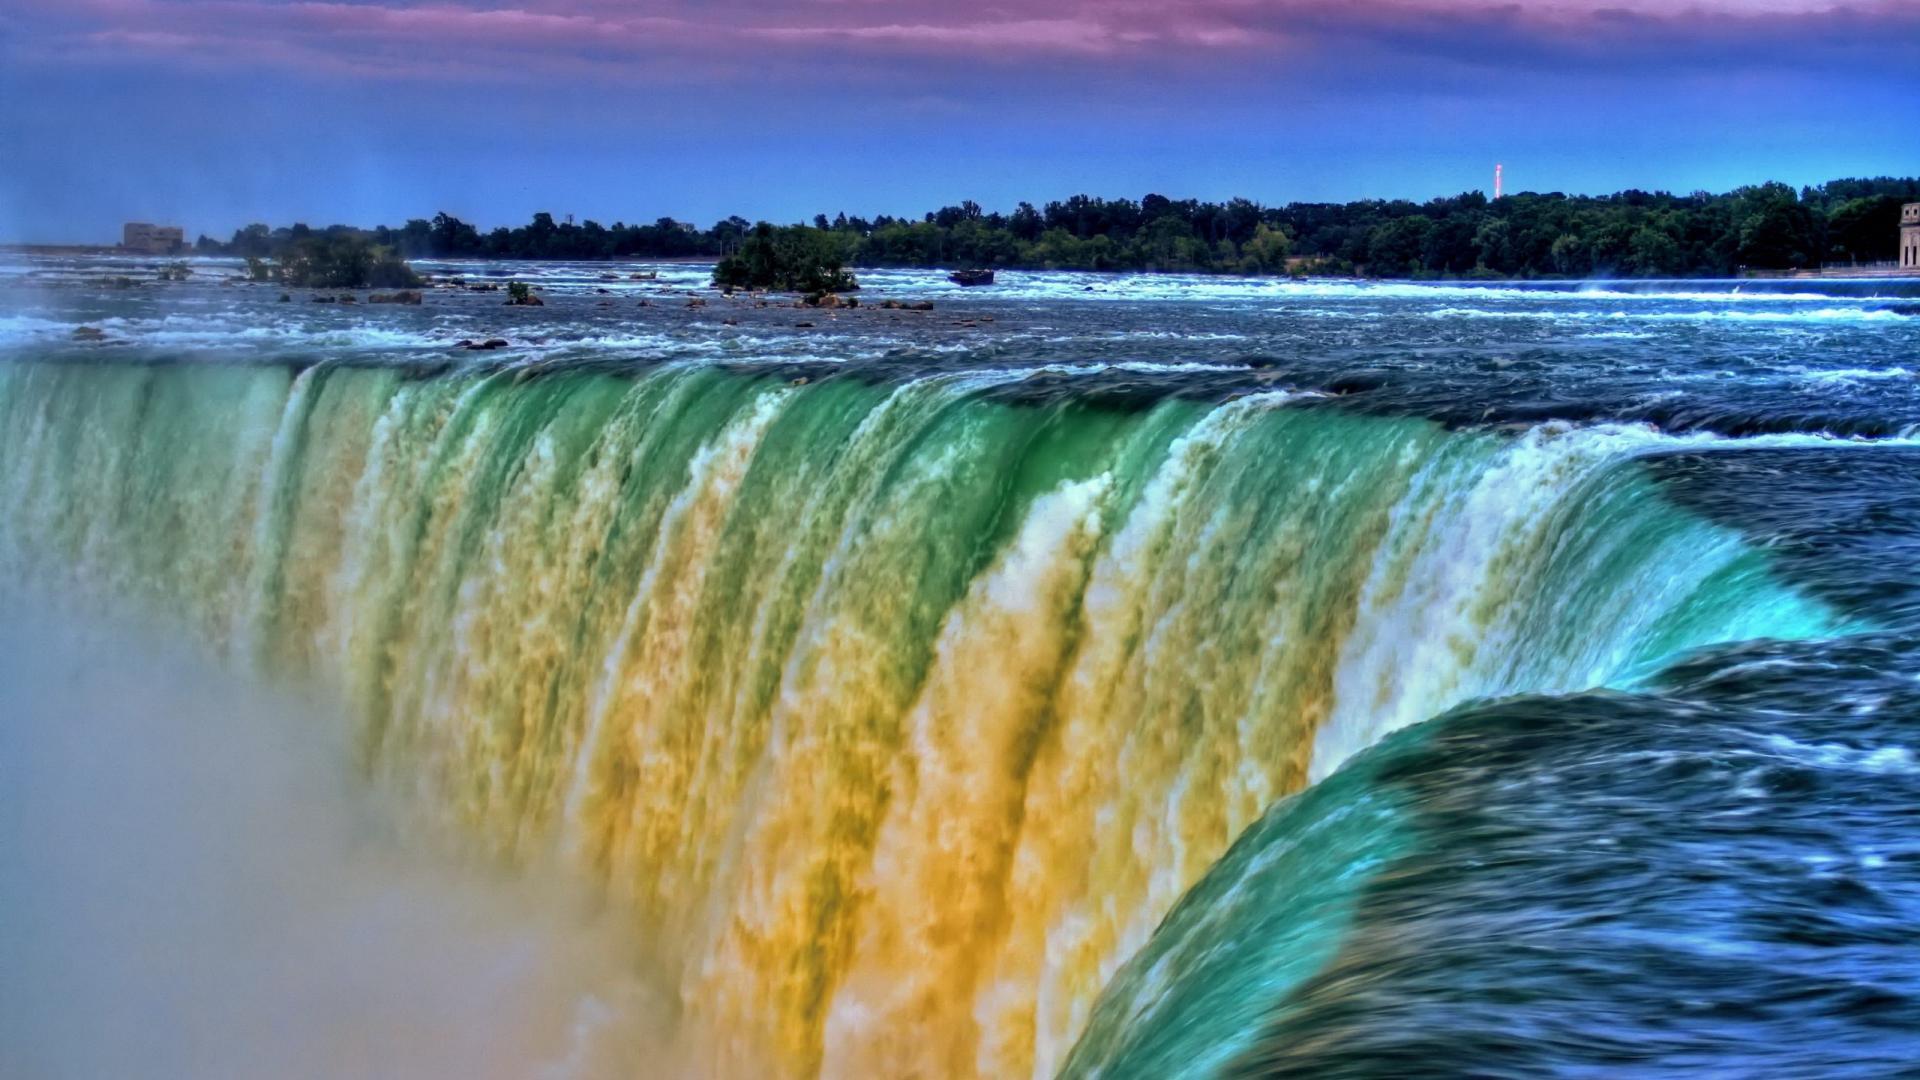 Hd Niagara Falls Wallpaper North America Wallpapers Wallpaper Cave